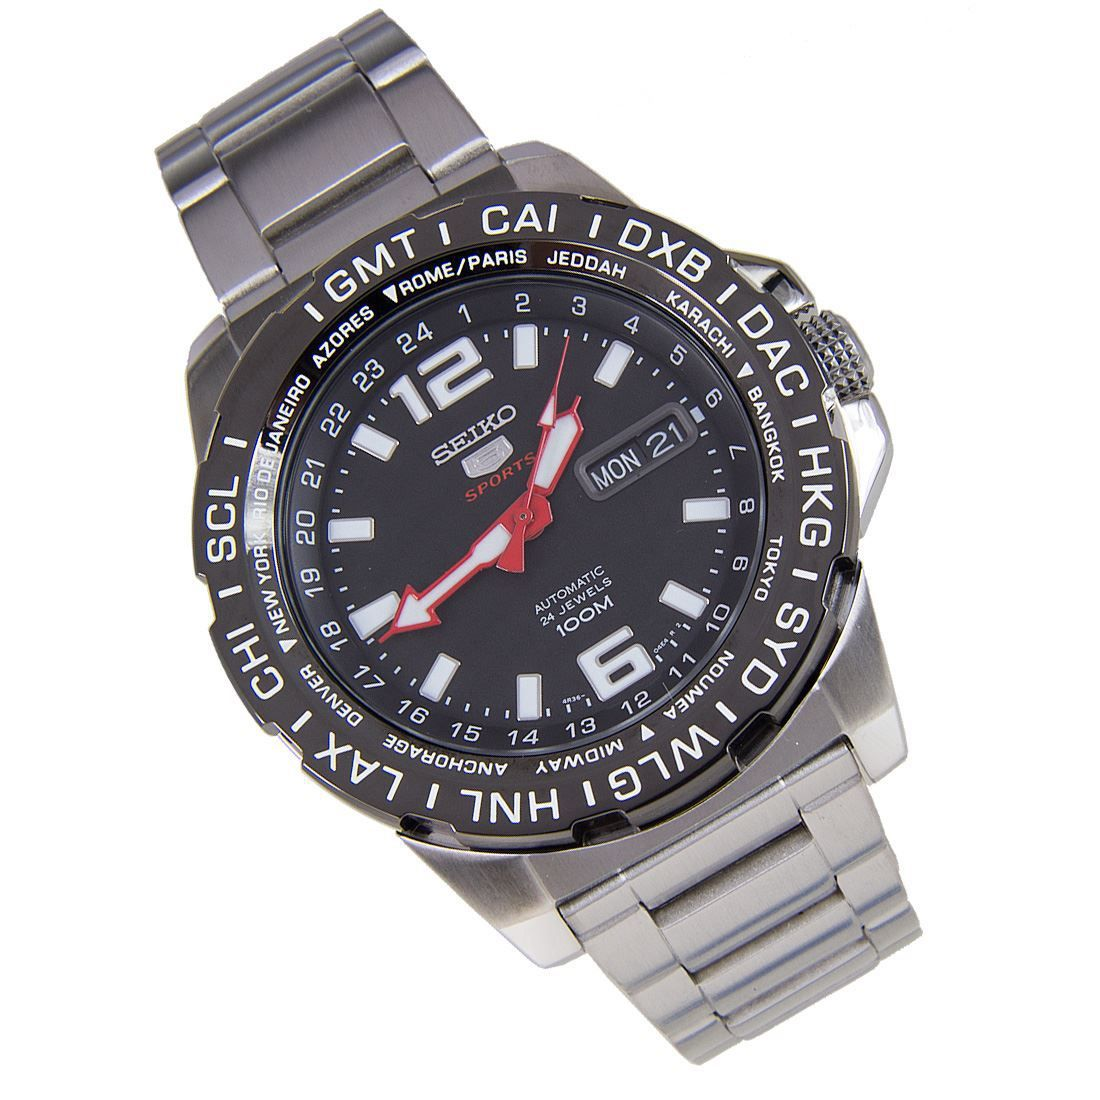 SRP685K1 SRP685 Seiko 5 Sports Automatic Watch Seiko 5